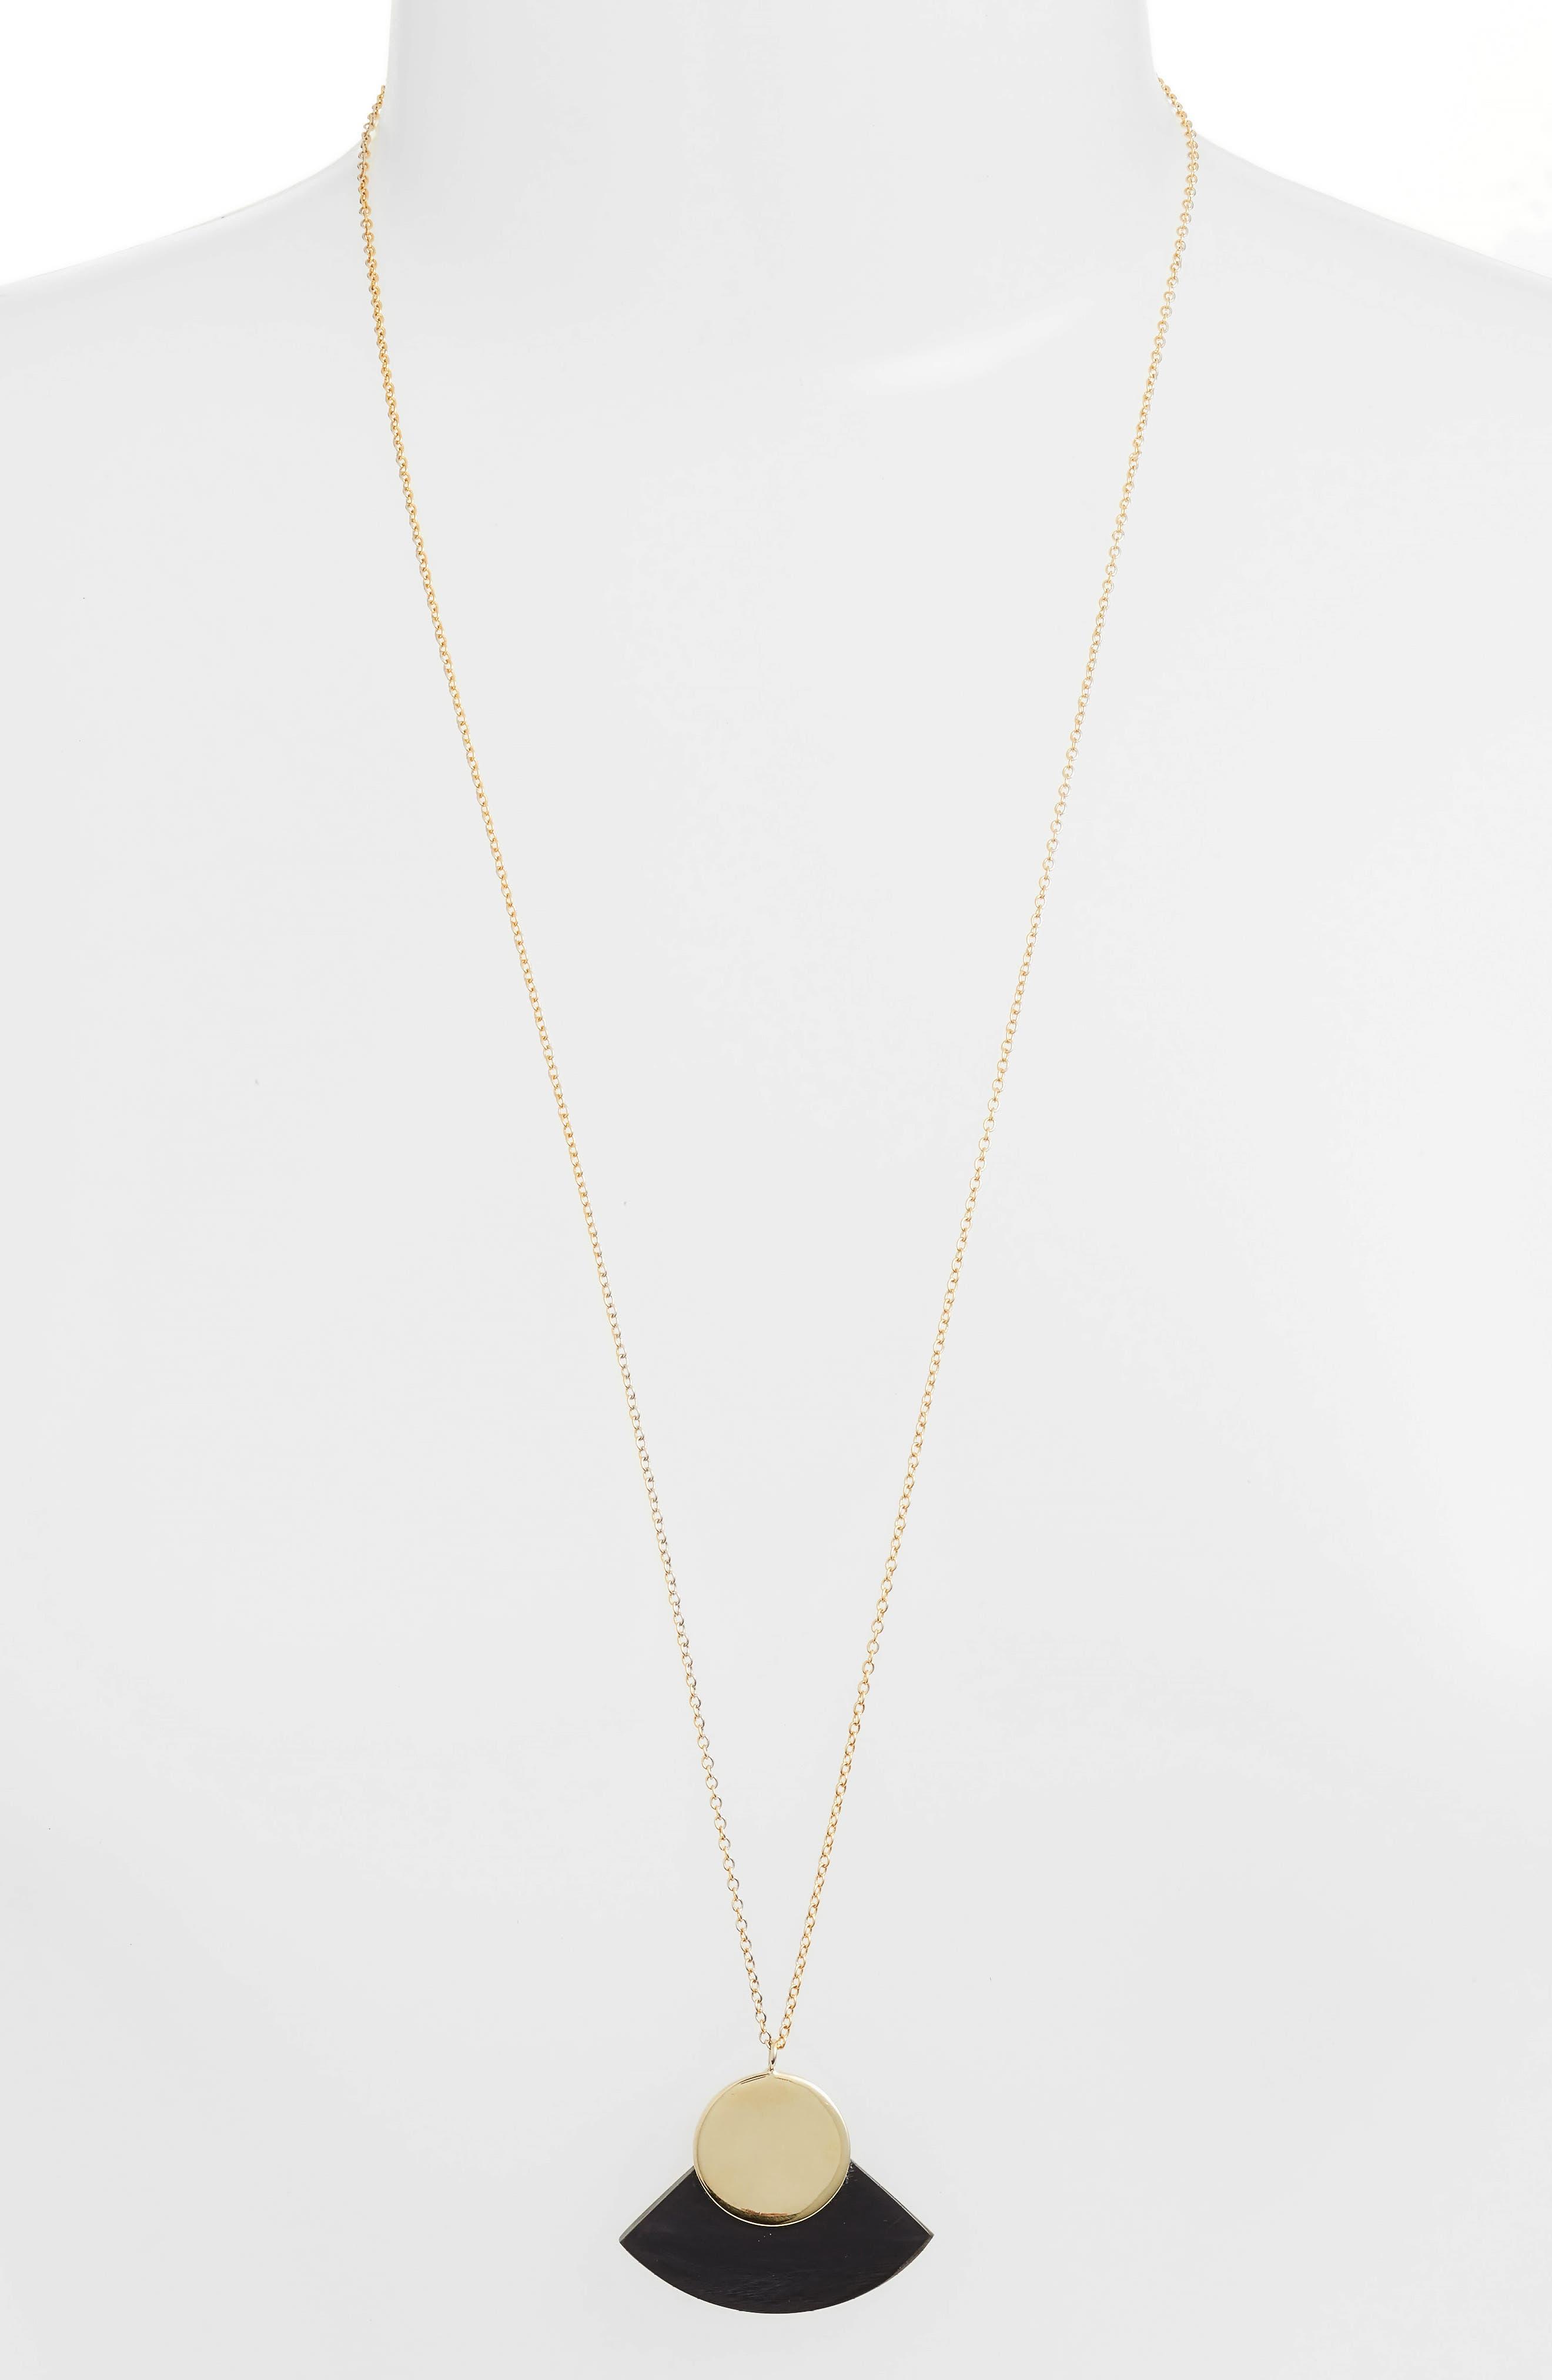 Horn Paddle Pendant Necklace,                             Main thumbnail 1, color,                             BLACK/ BRASS